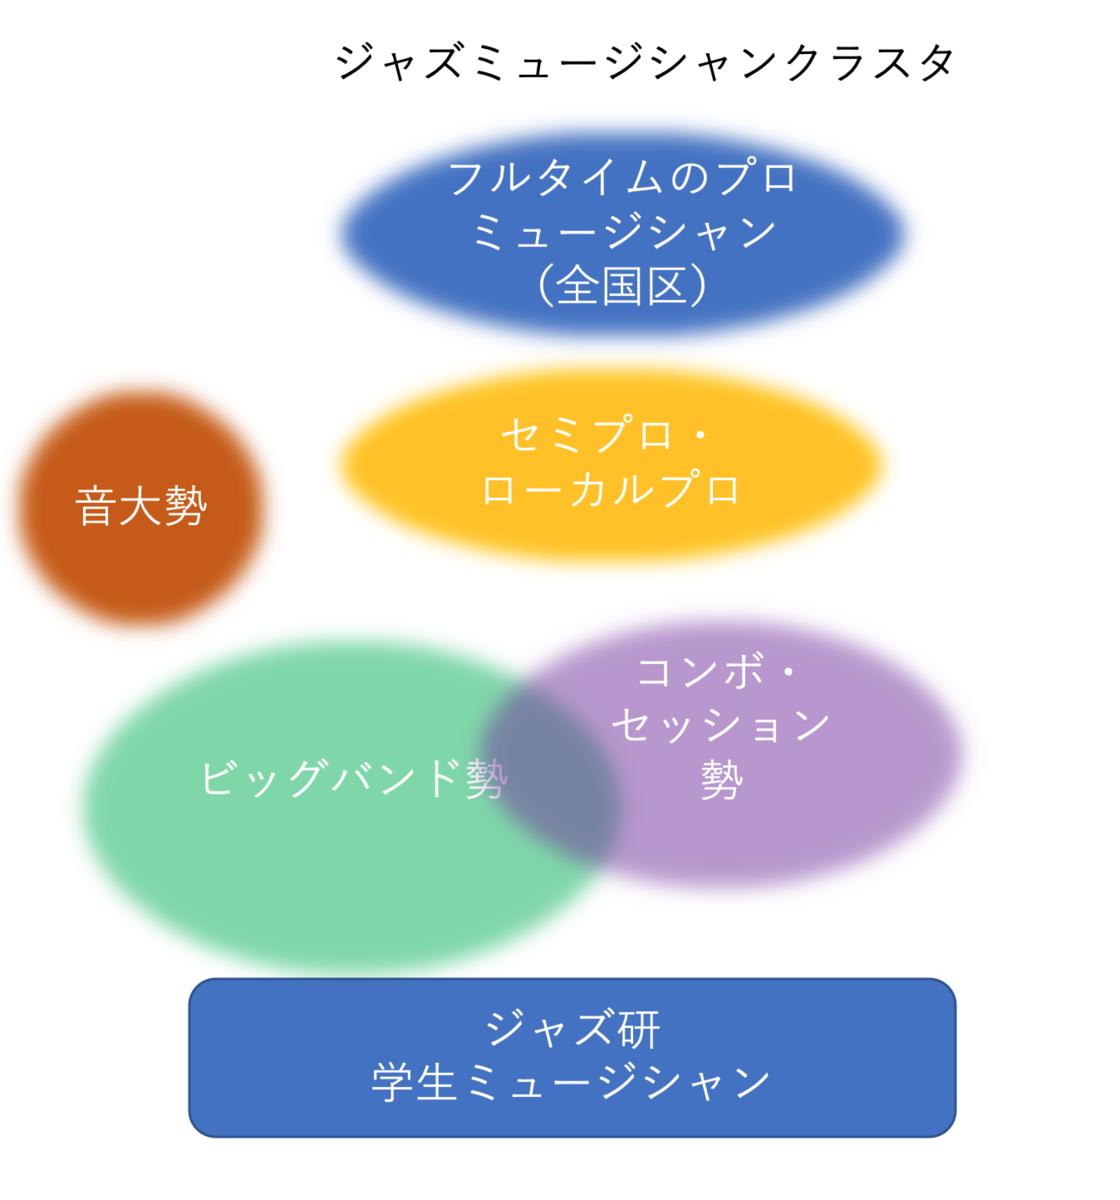 f:id:hanjukudoctor:20200424164325p:plain:w400